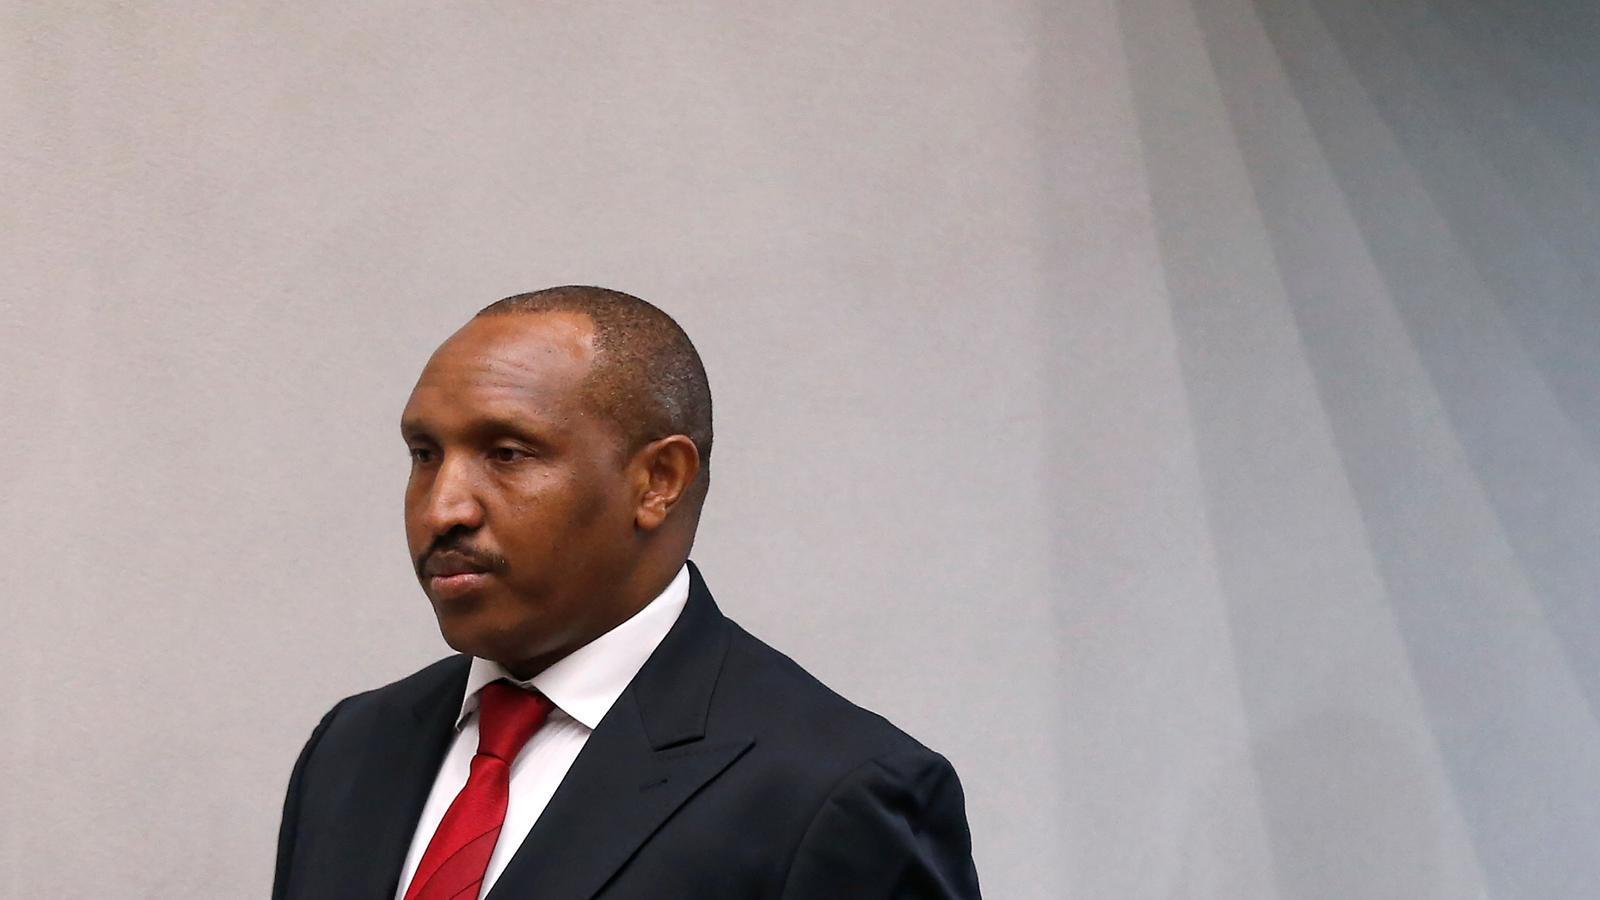 Condemnat per 18 crims de guerra el Terminator del Congo